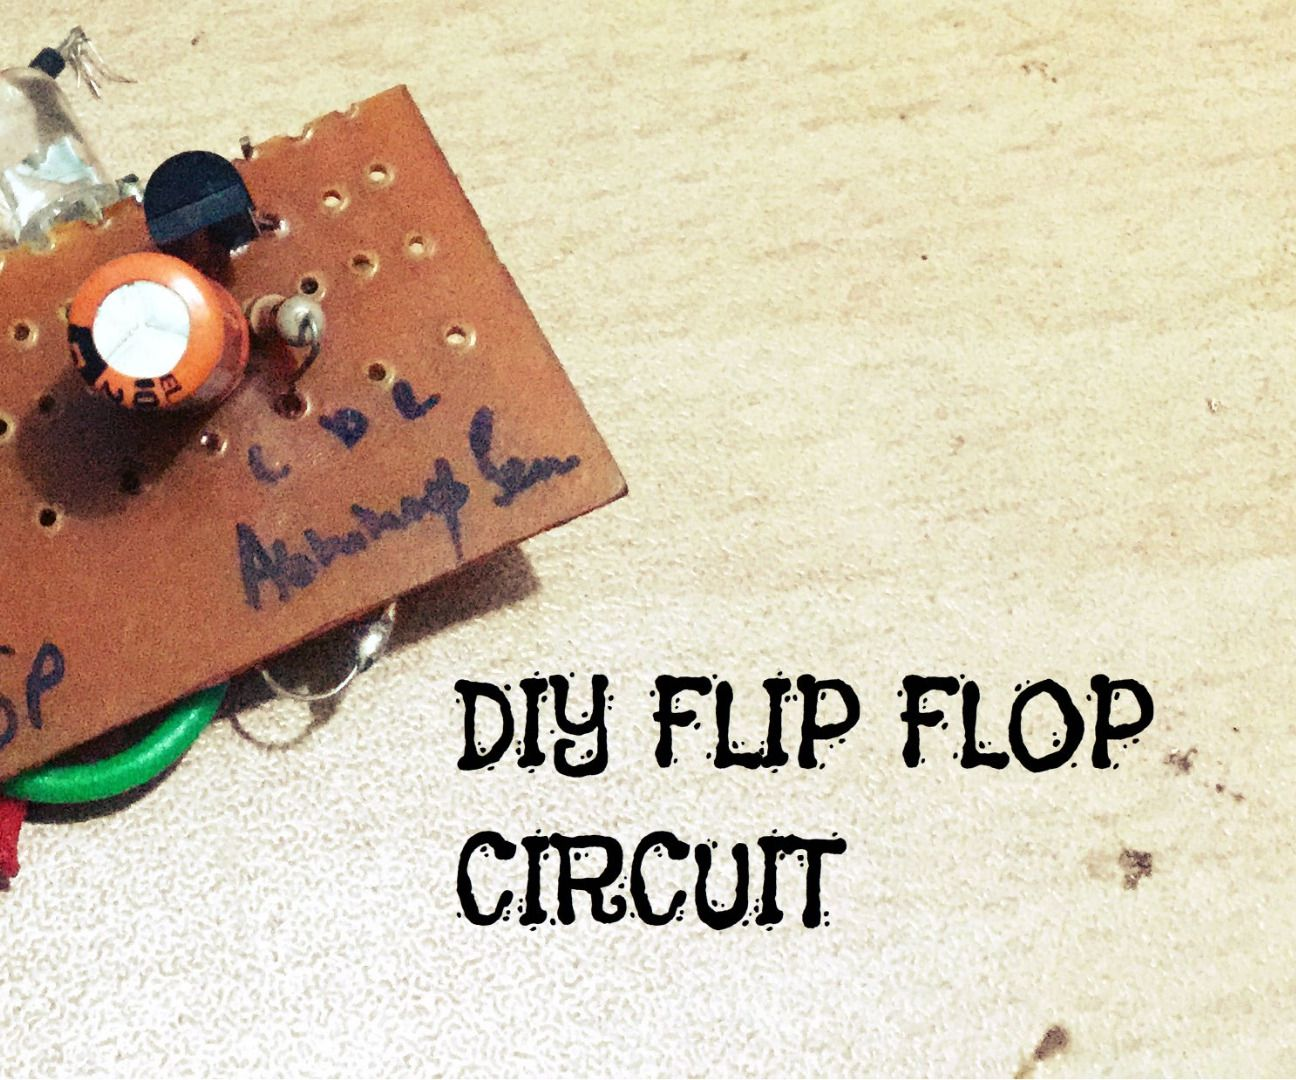 Diy Flip Flop Multi Vibrator Circuit 3 Steps Flops